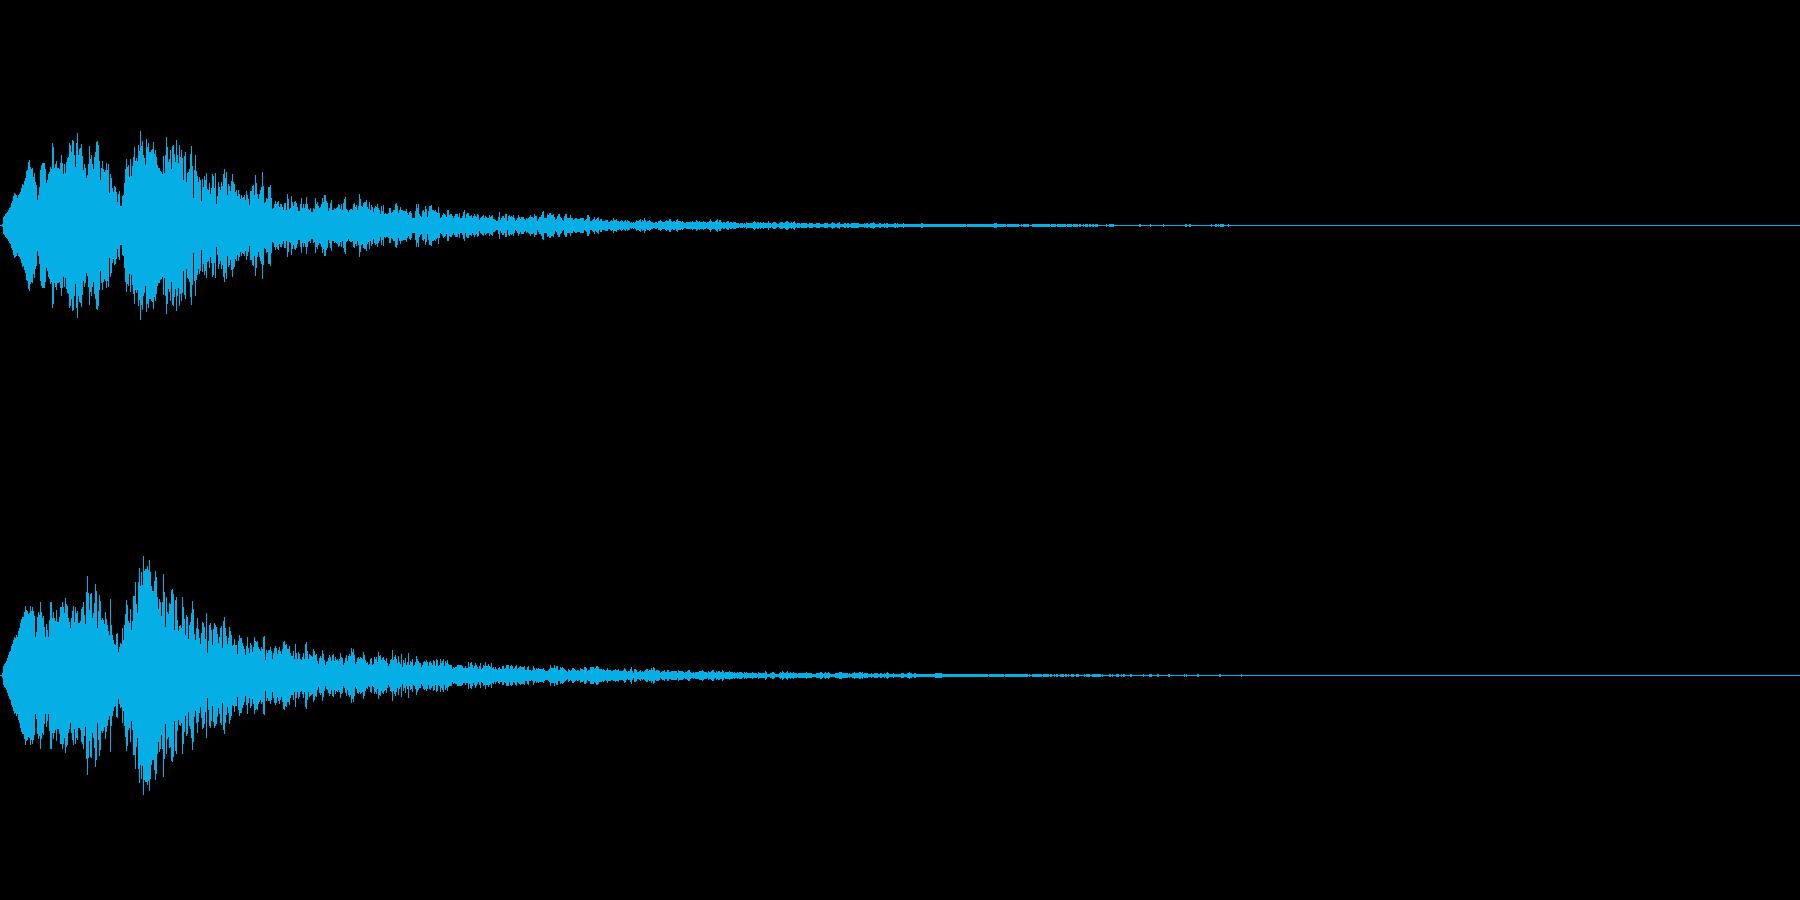 Vox 不気味な鳴き声 ホラーSE 5の再生済みの波形